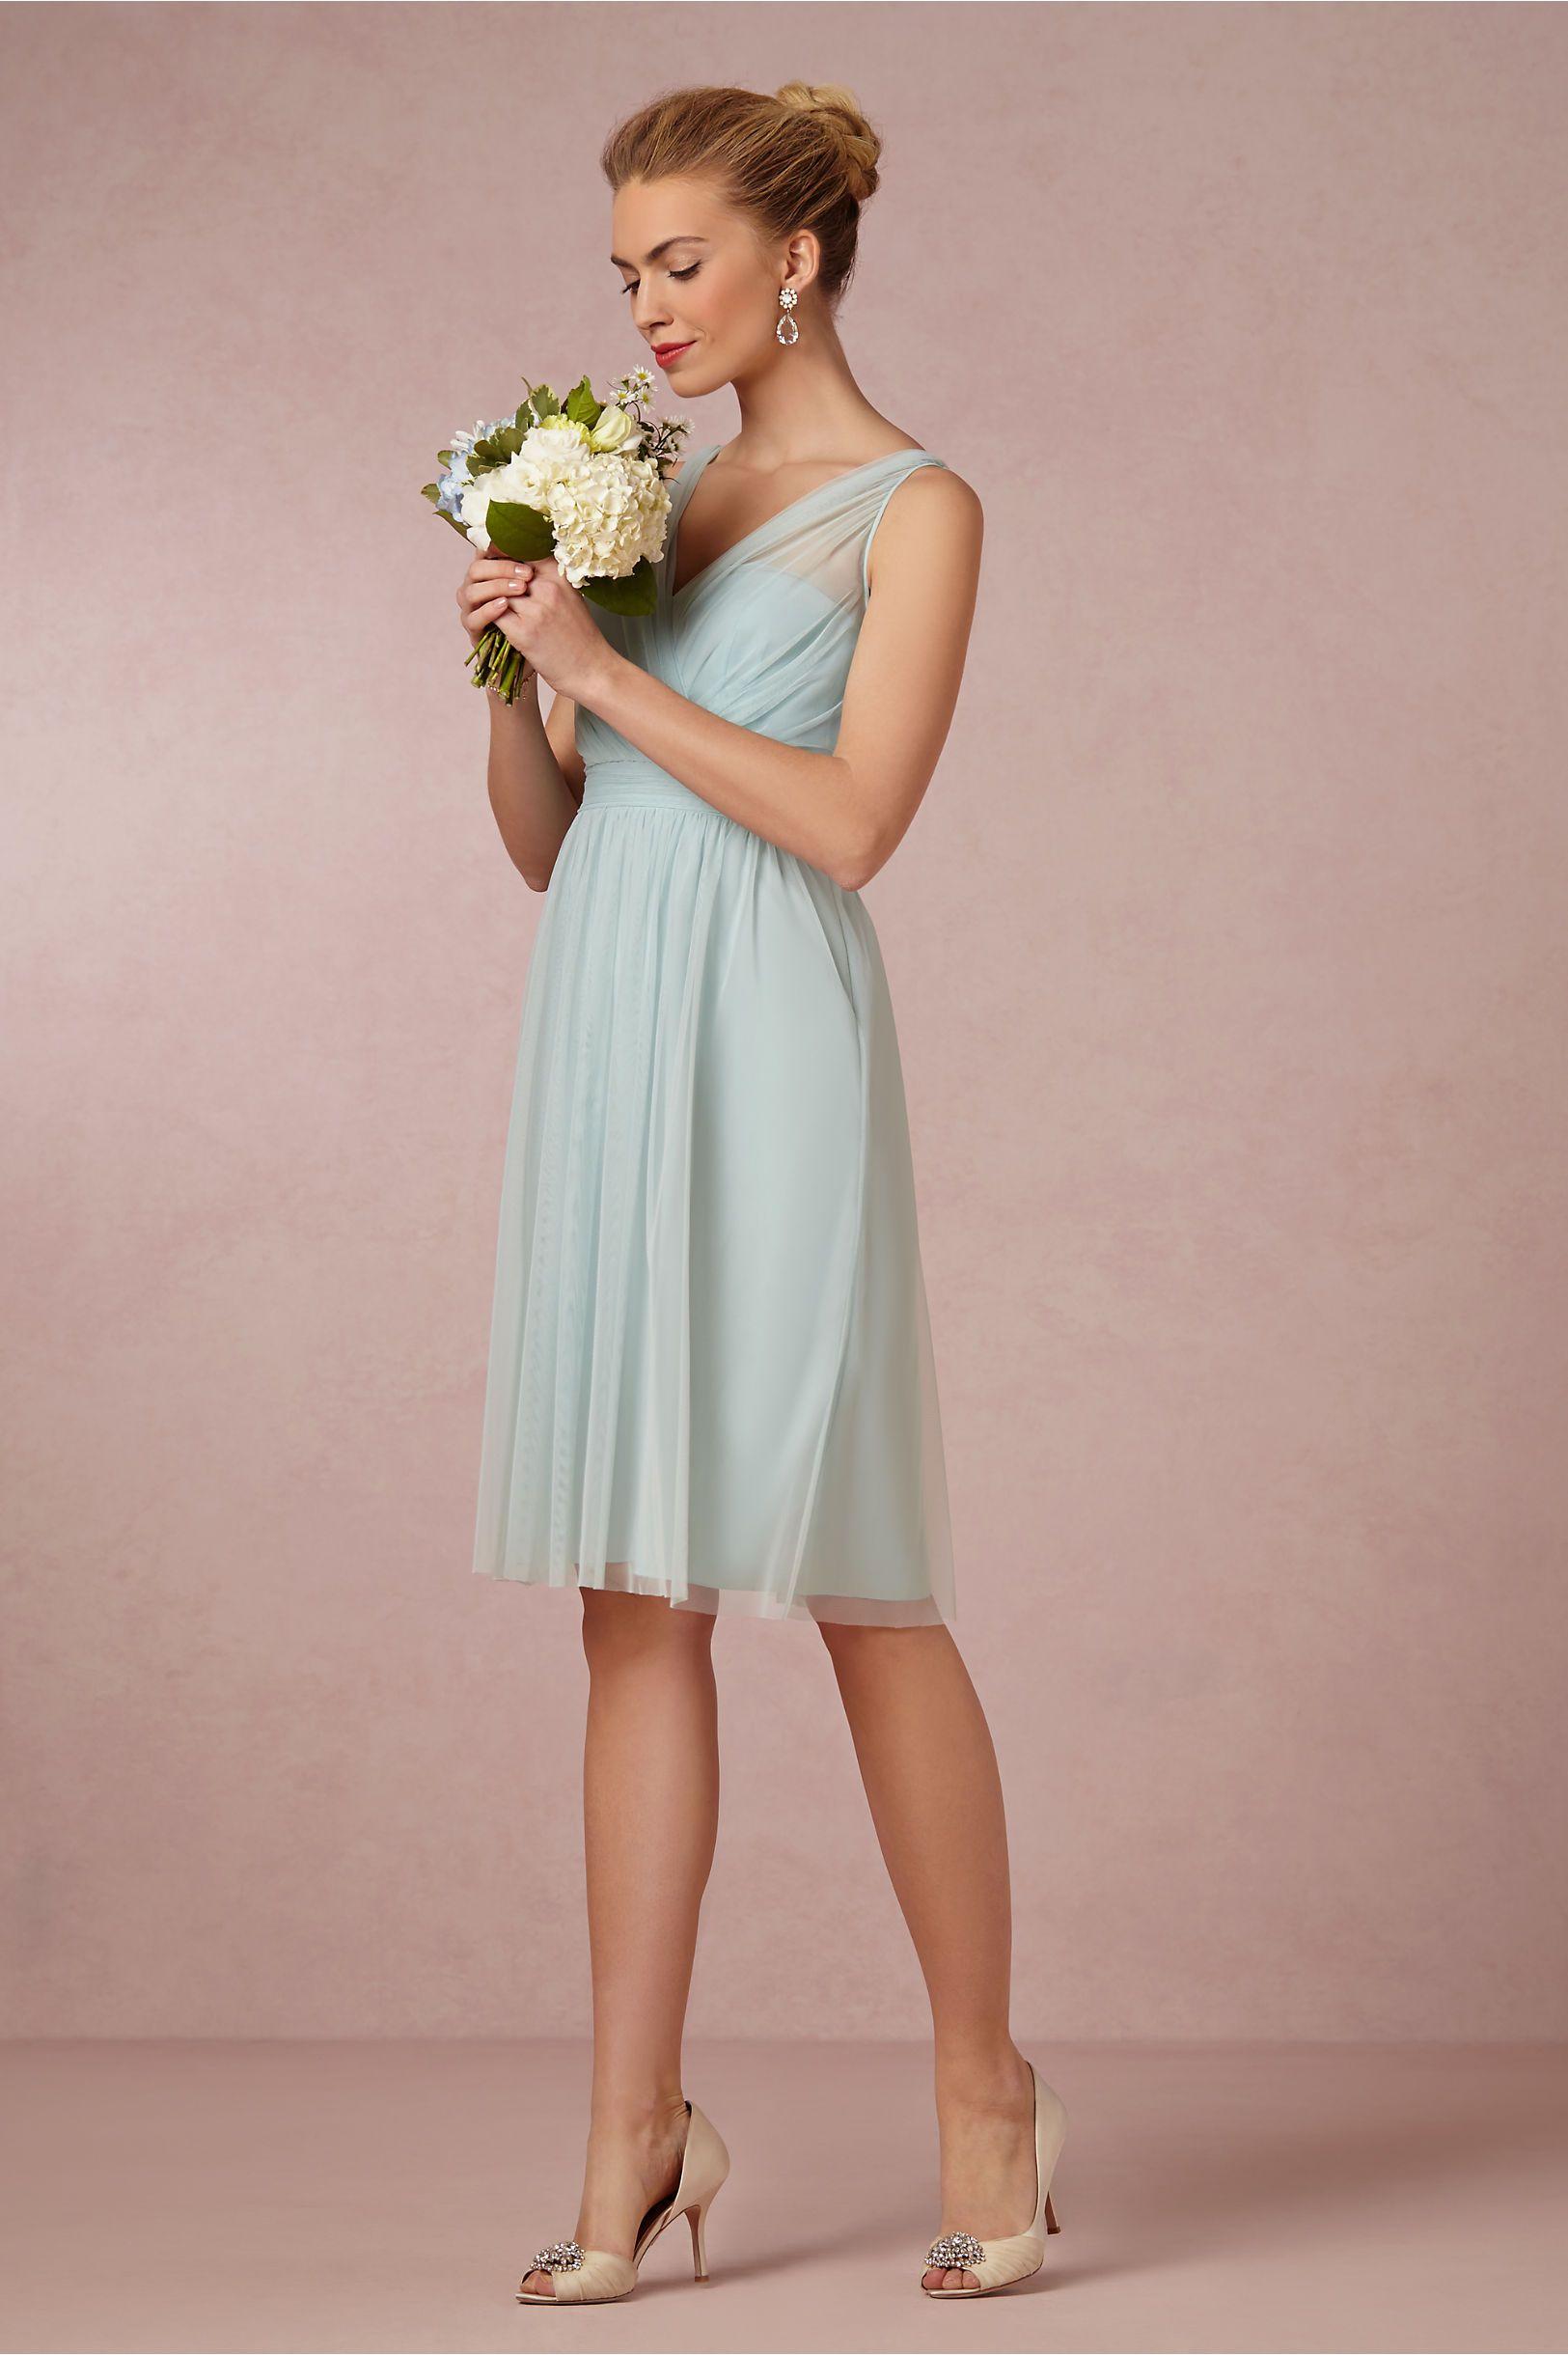 Peach dress for wedding guest  Tansy Dress from BHLDN  flowerscolor palette  Pinterest  Bhldn